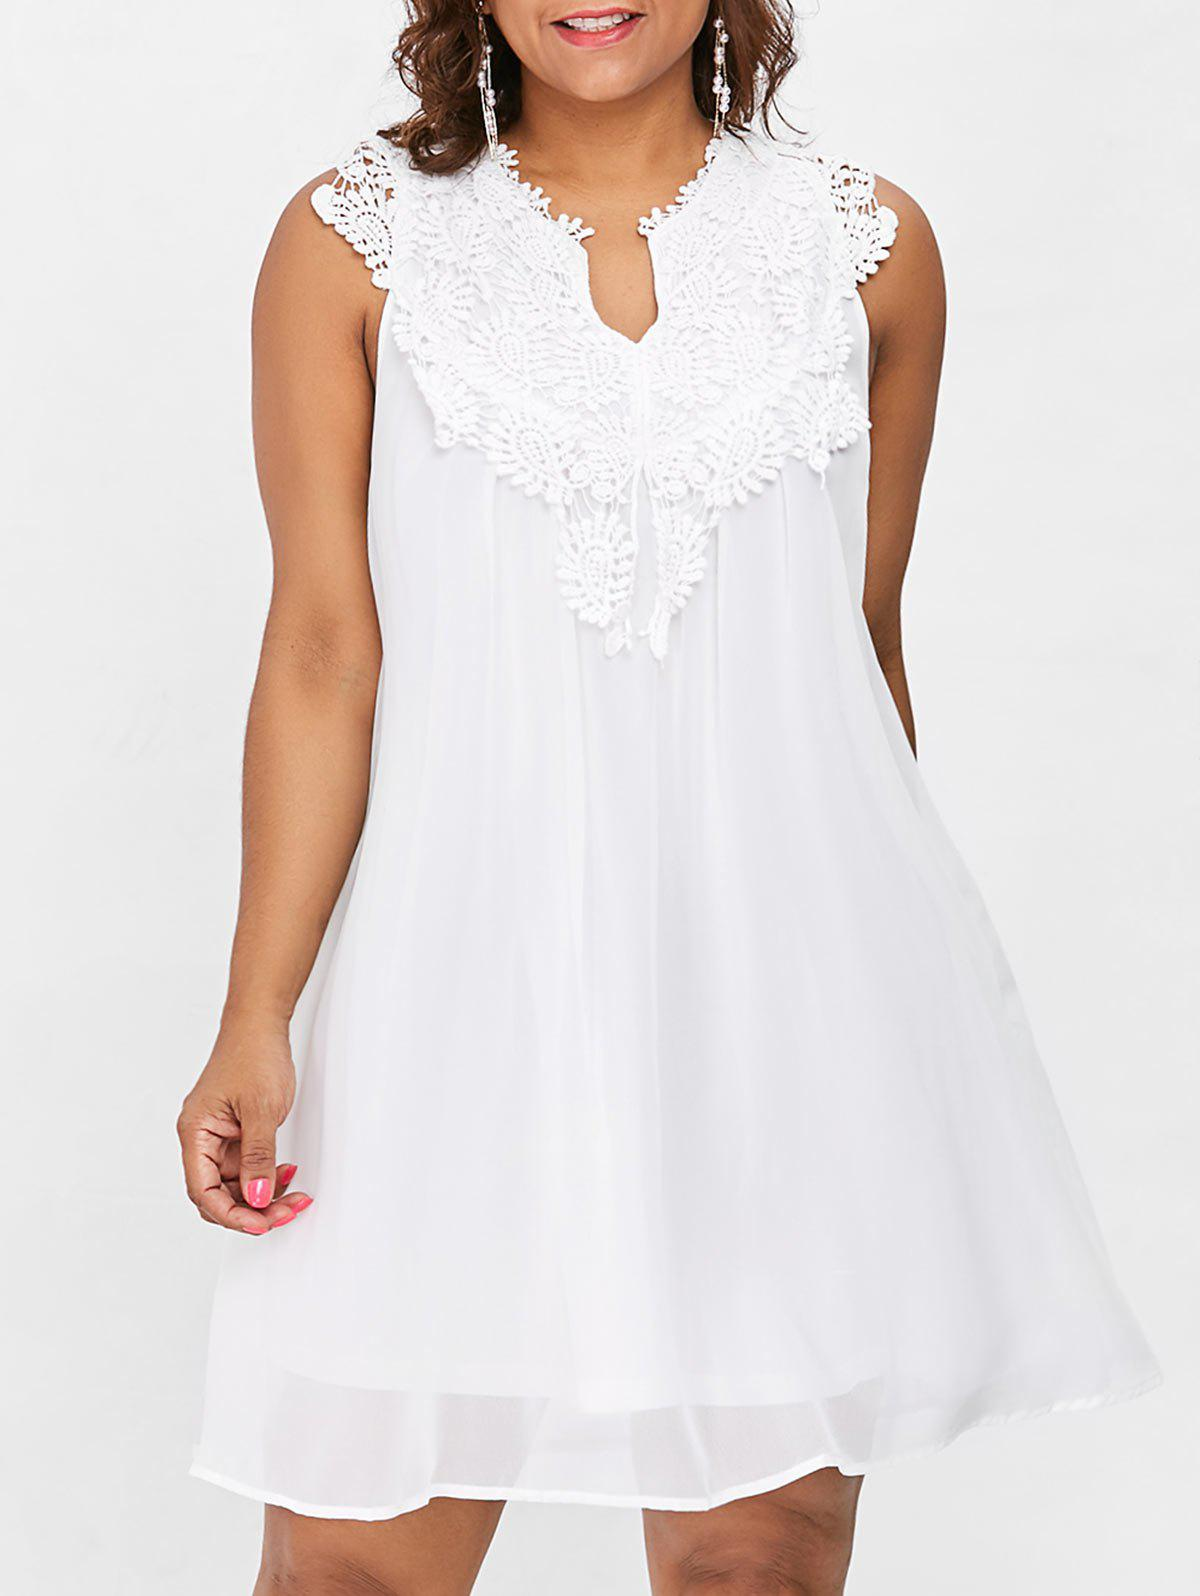 Plus Size Hollow Out Lace Panel Dress